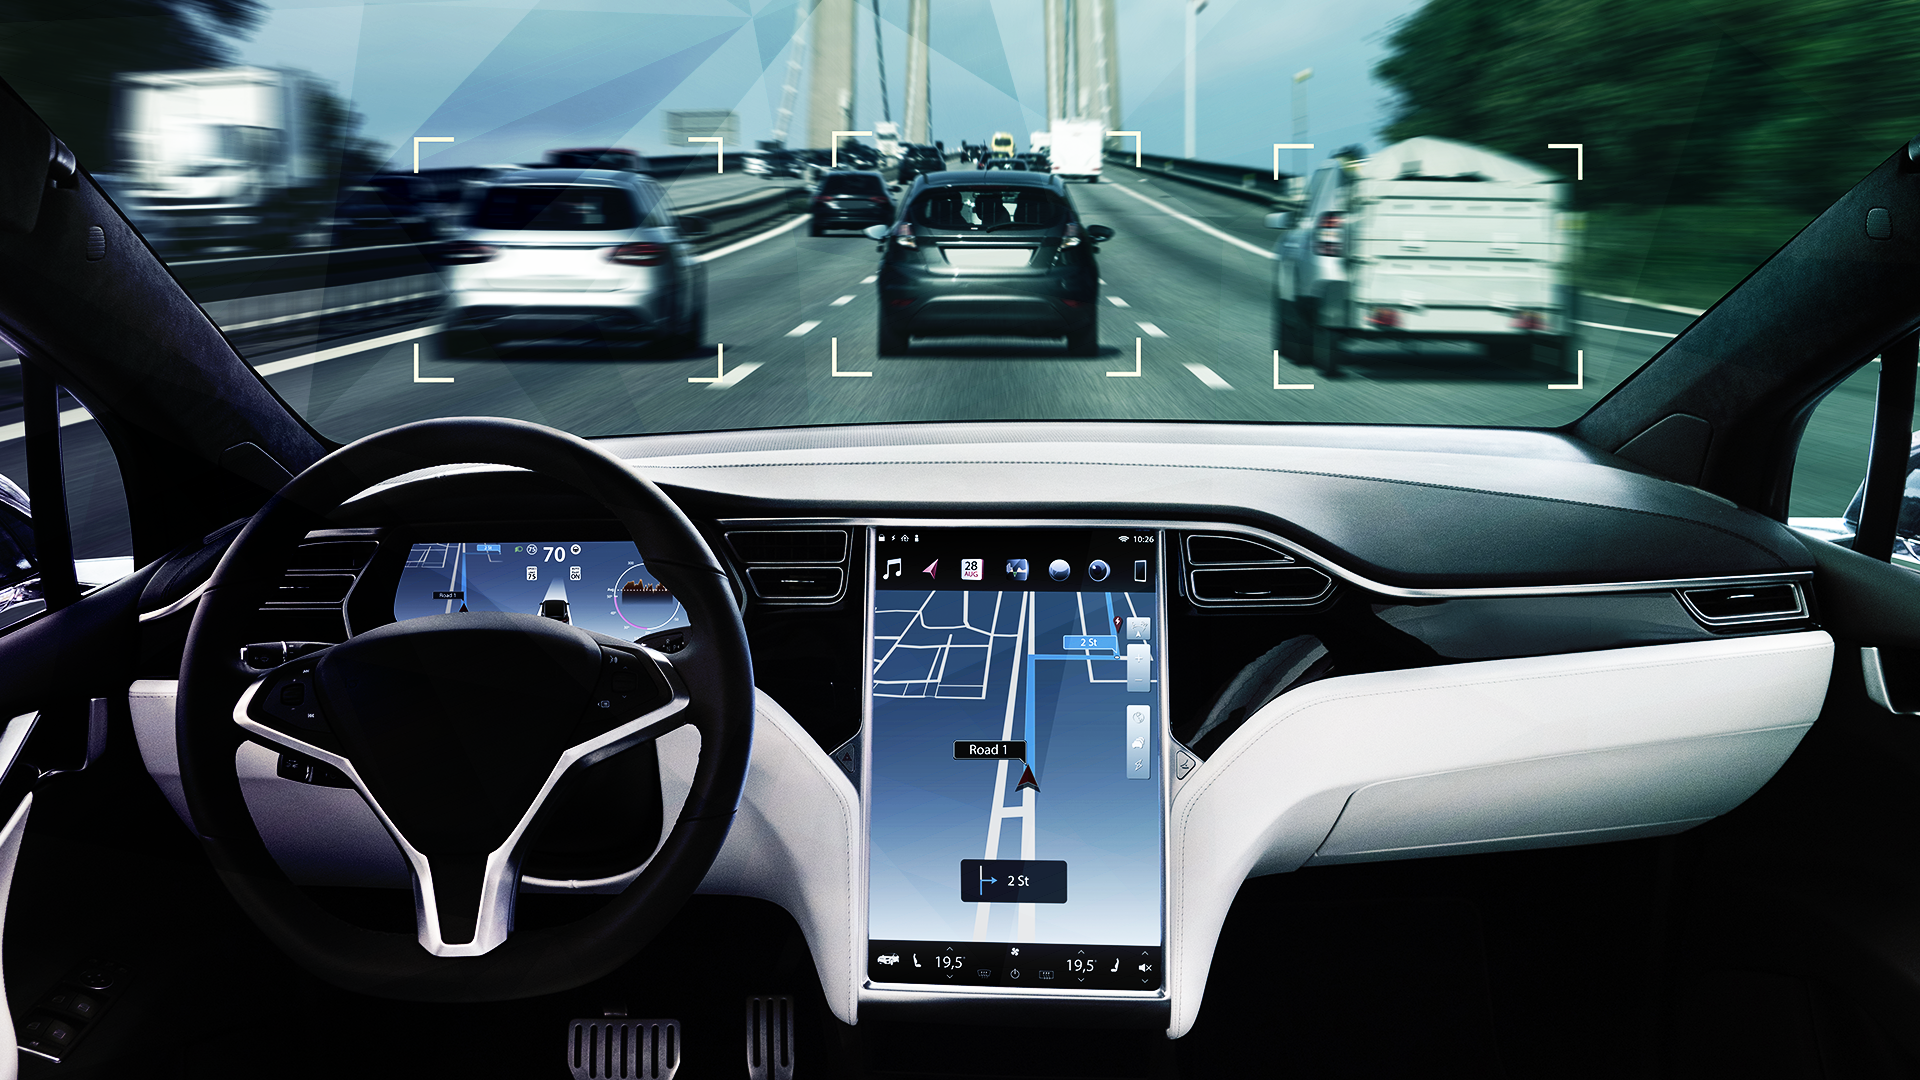 Auto, Elektroautos, tesla, Tesla Motors, Elektroauto, E-Auto, Selbstfahrendes Auto, Autonomes Auto, Selbstfahrend, Verkehr, Autopilot, Model 3, autonomes Fahren, Tesla Model S, Tesla Model 3, Autobahn